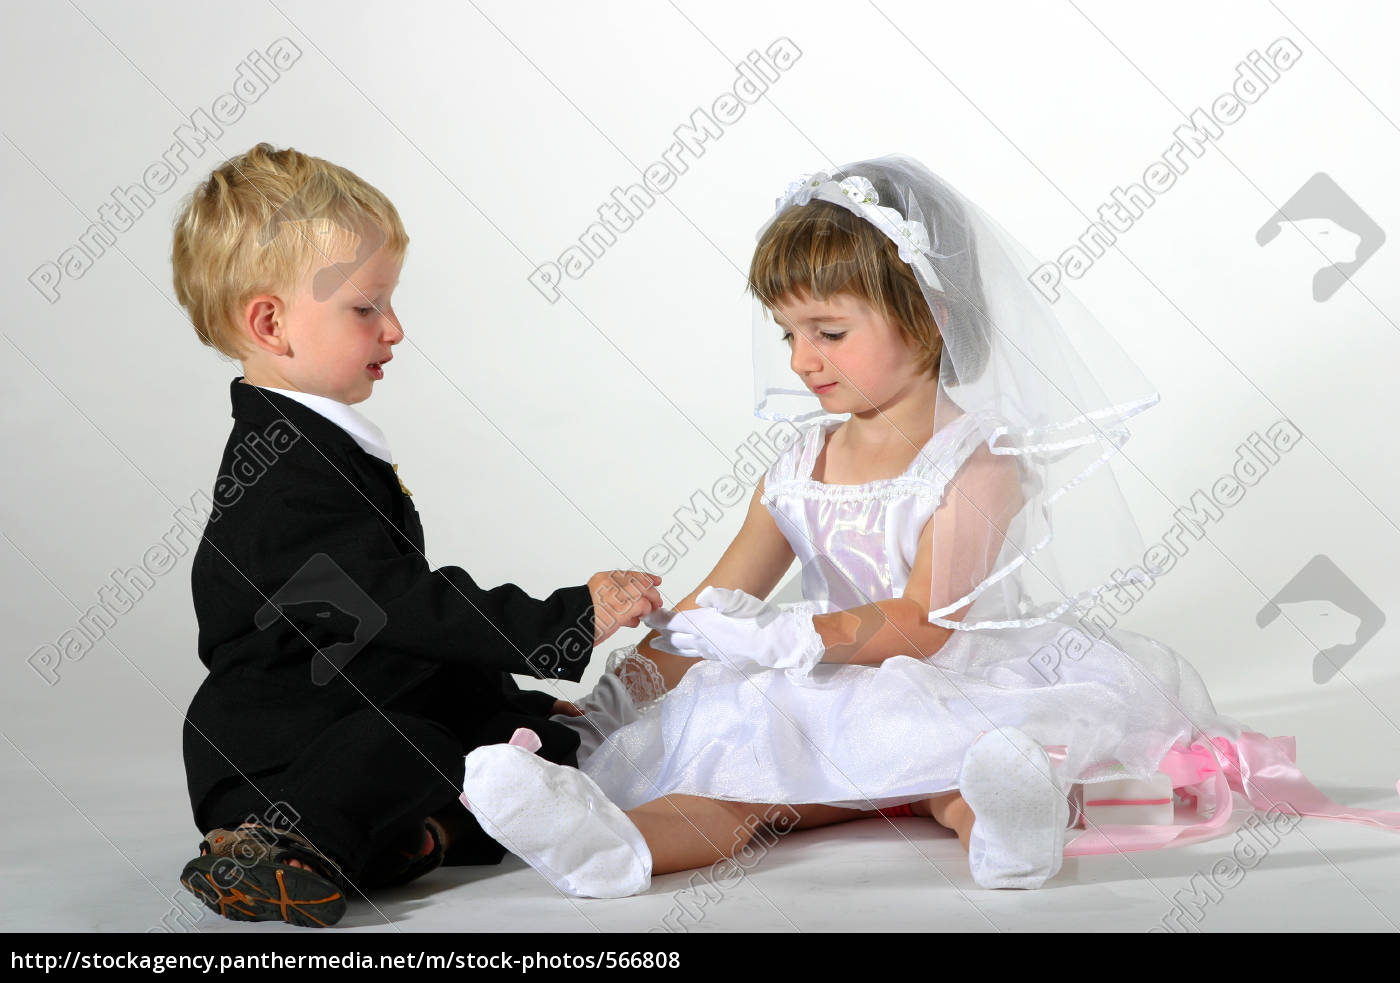 small, people, wedding - 566808